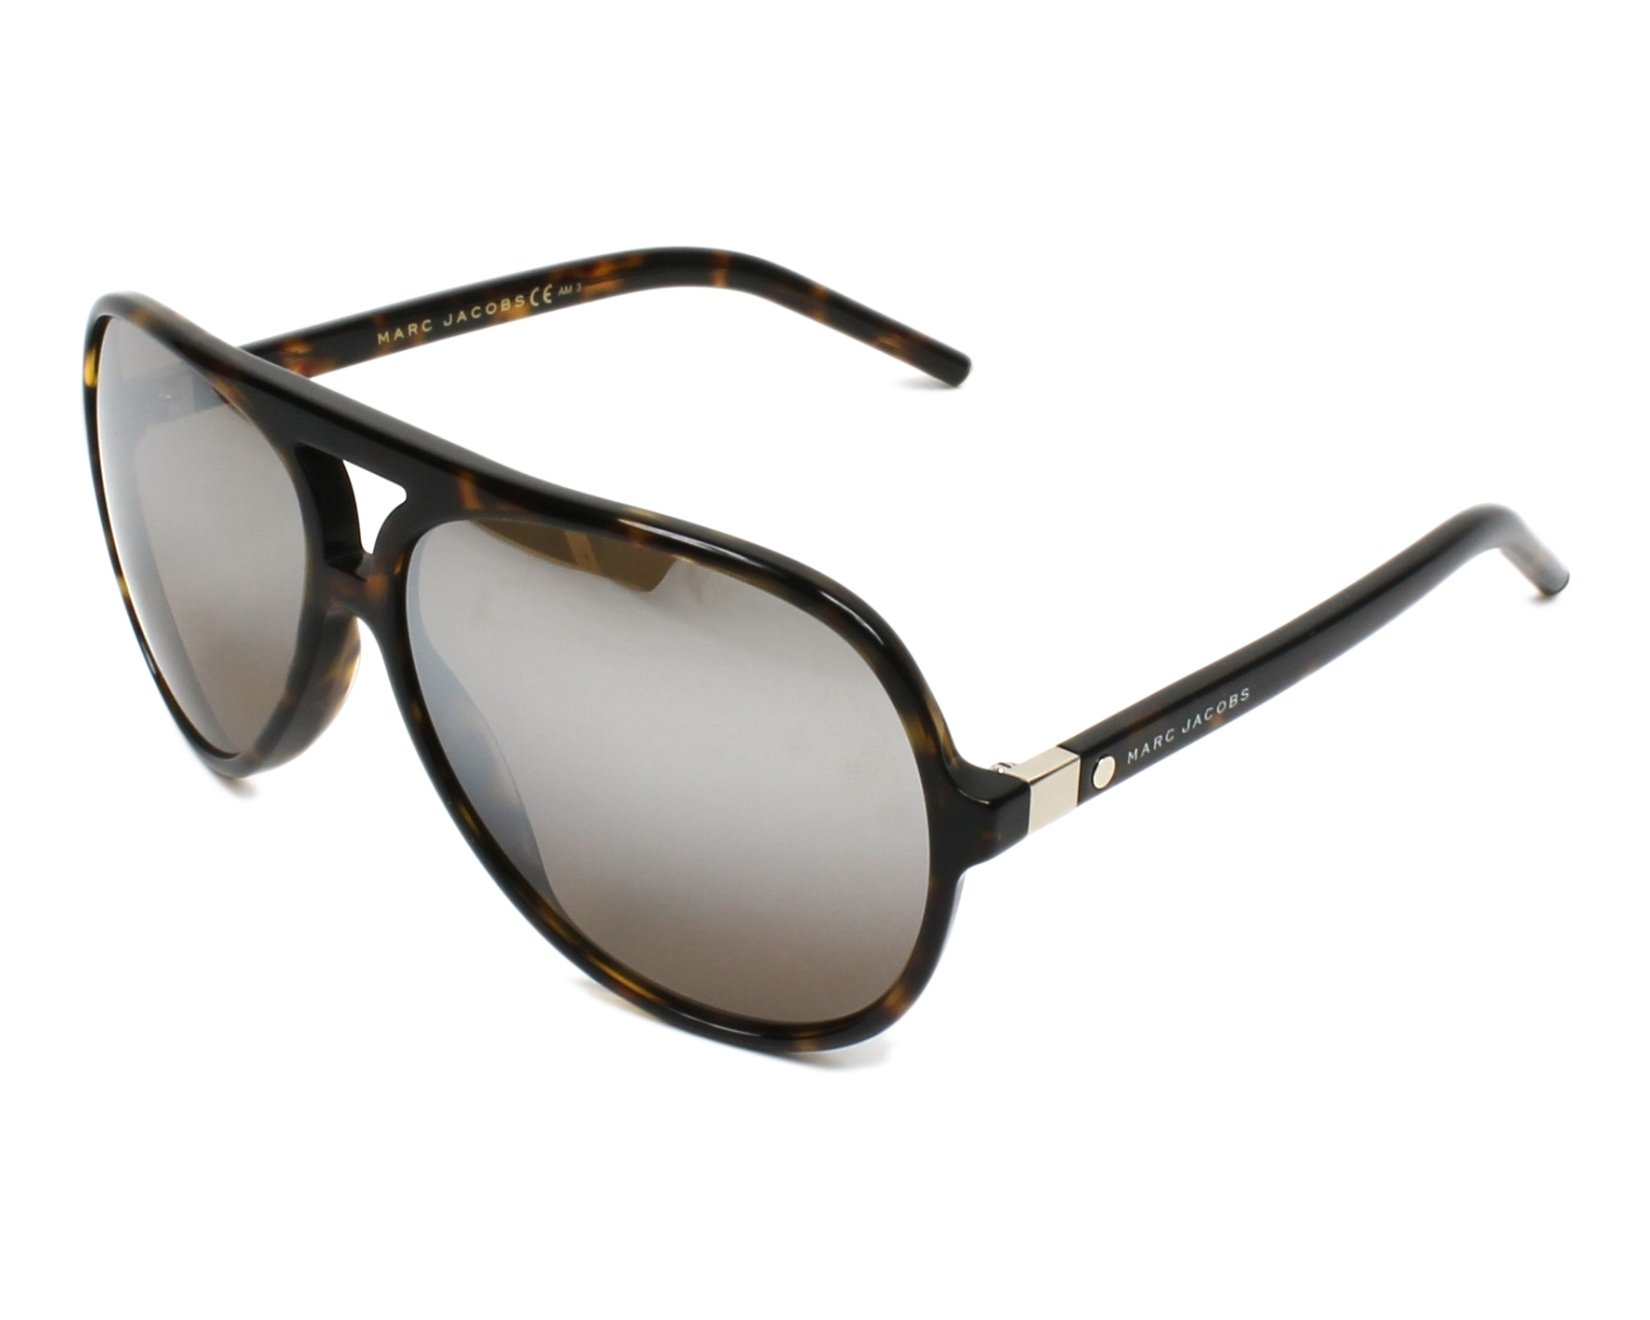 7bf0f72876e0a Sunglasses Marc Jacobs MARC-70-S 086 36 60-13 Havana profile